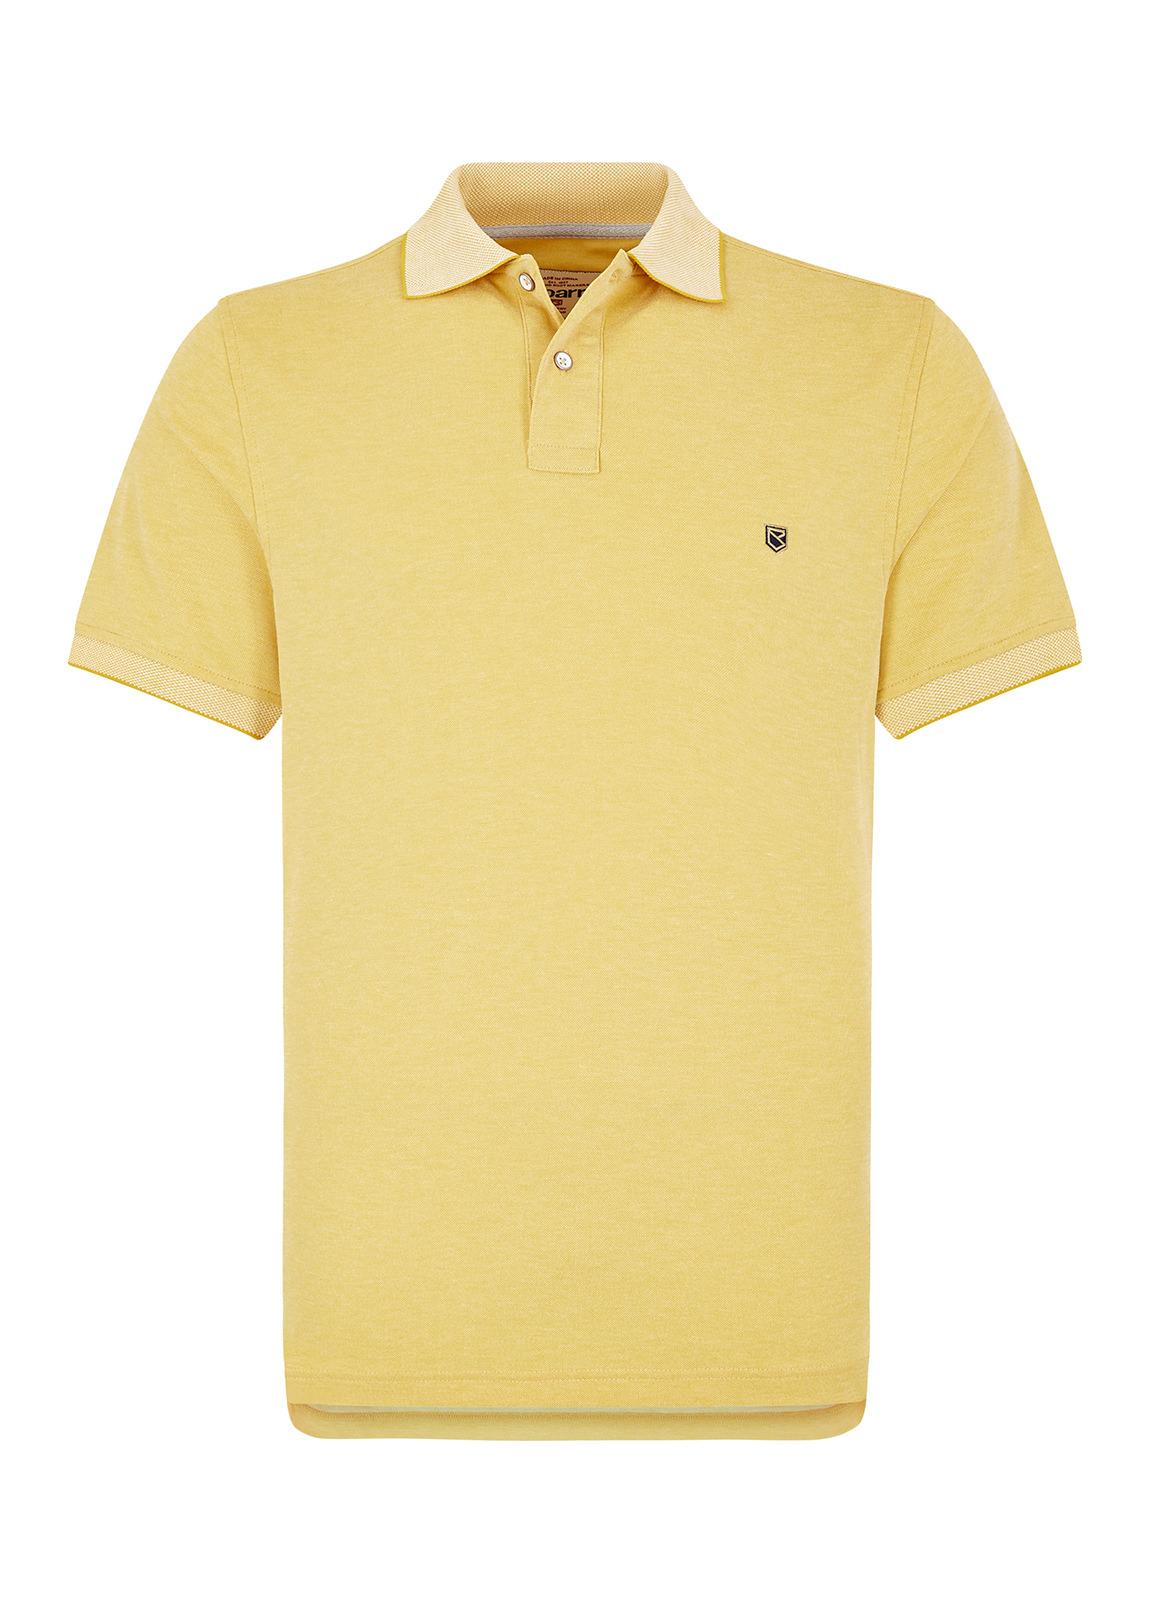 Dubarry_ Kylemore polo shirt - Sunflower_Image_2